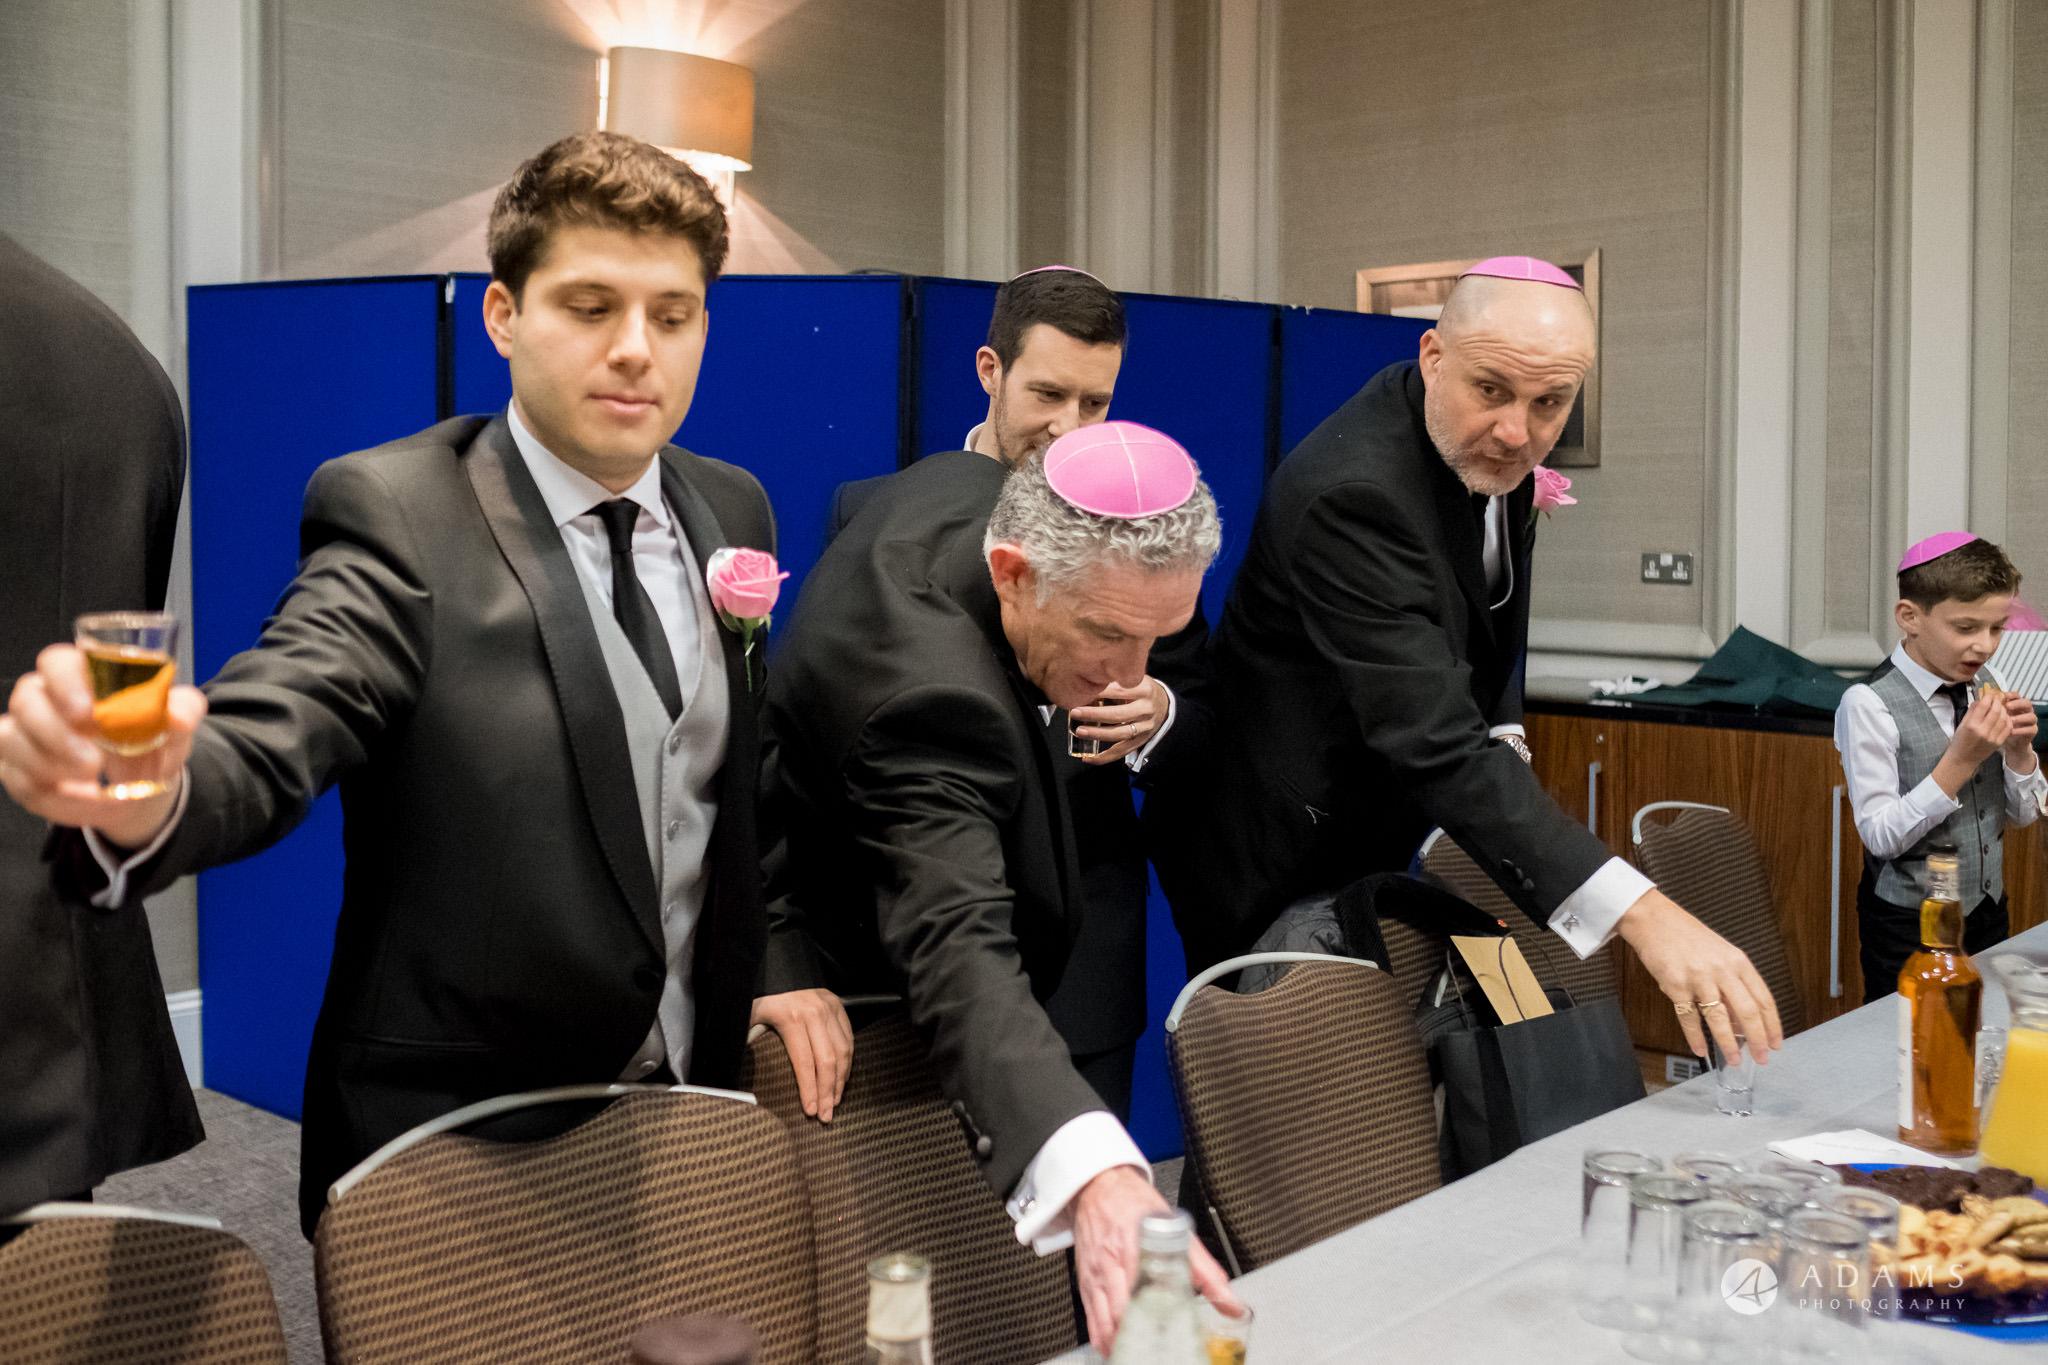 grand connaught rooms wedding men are having tisch